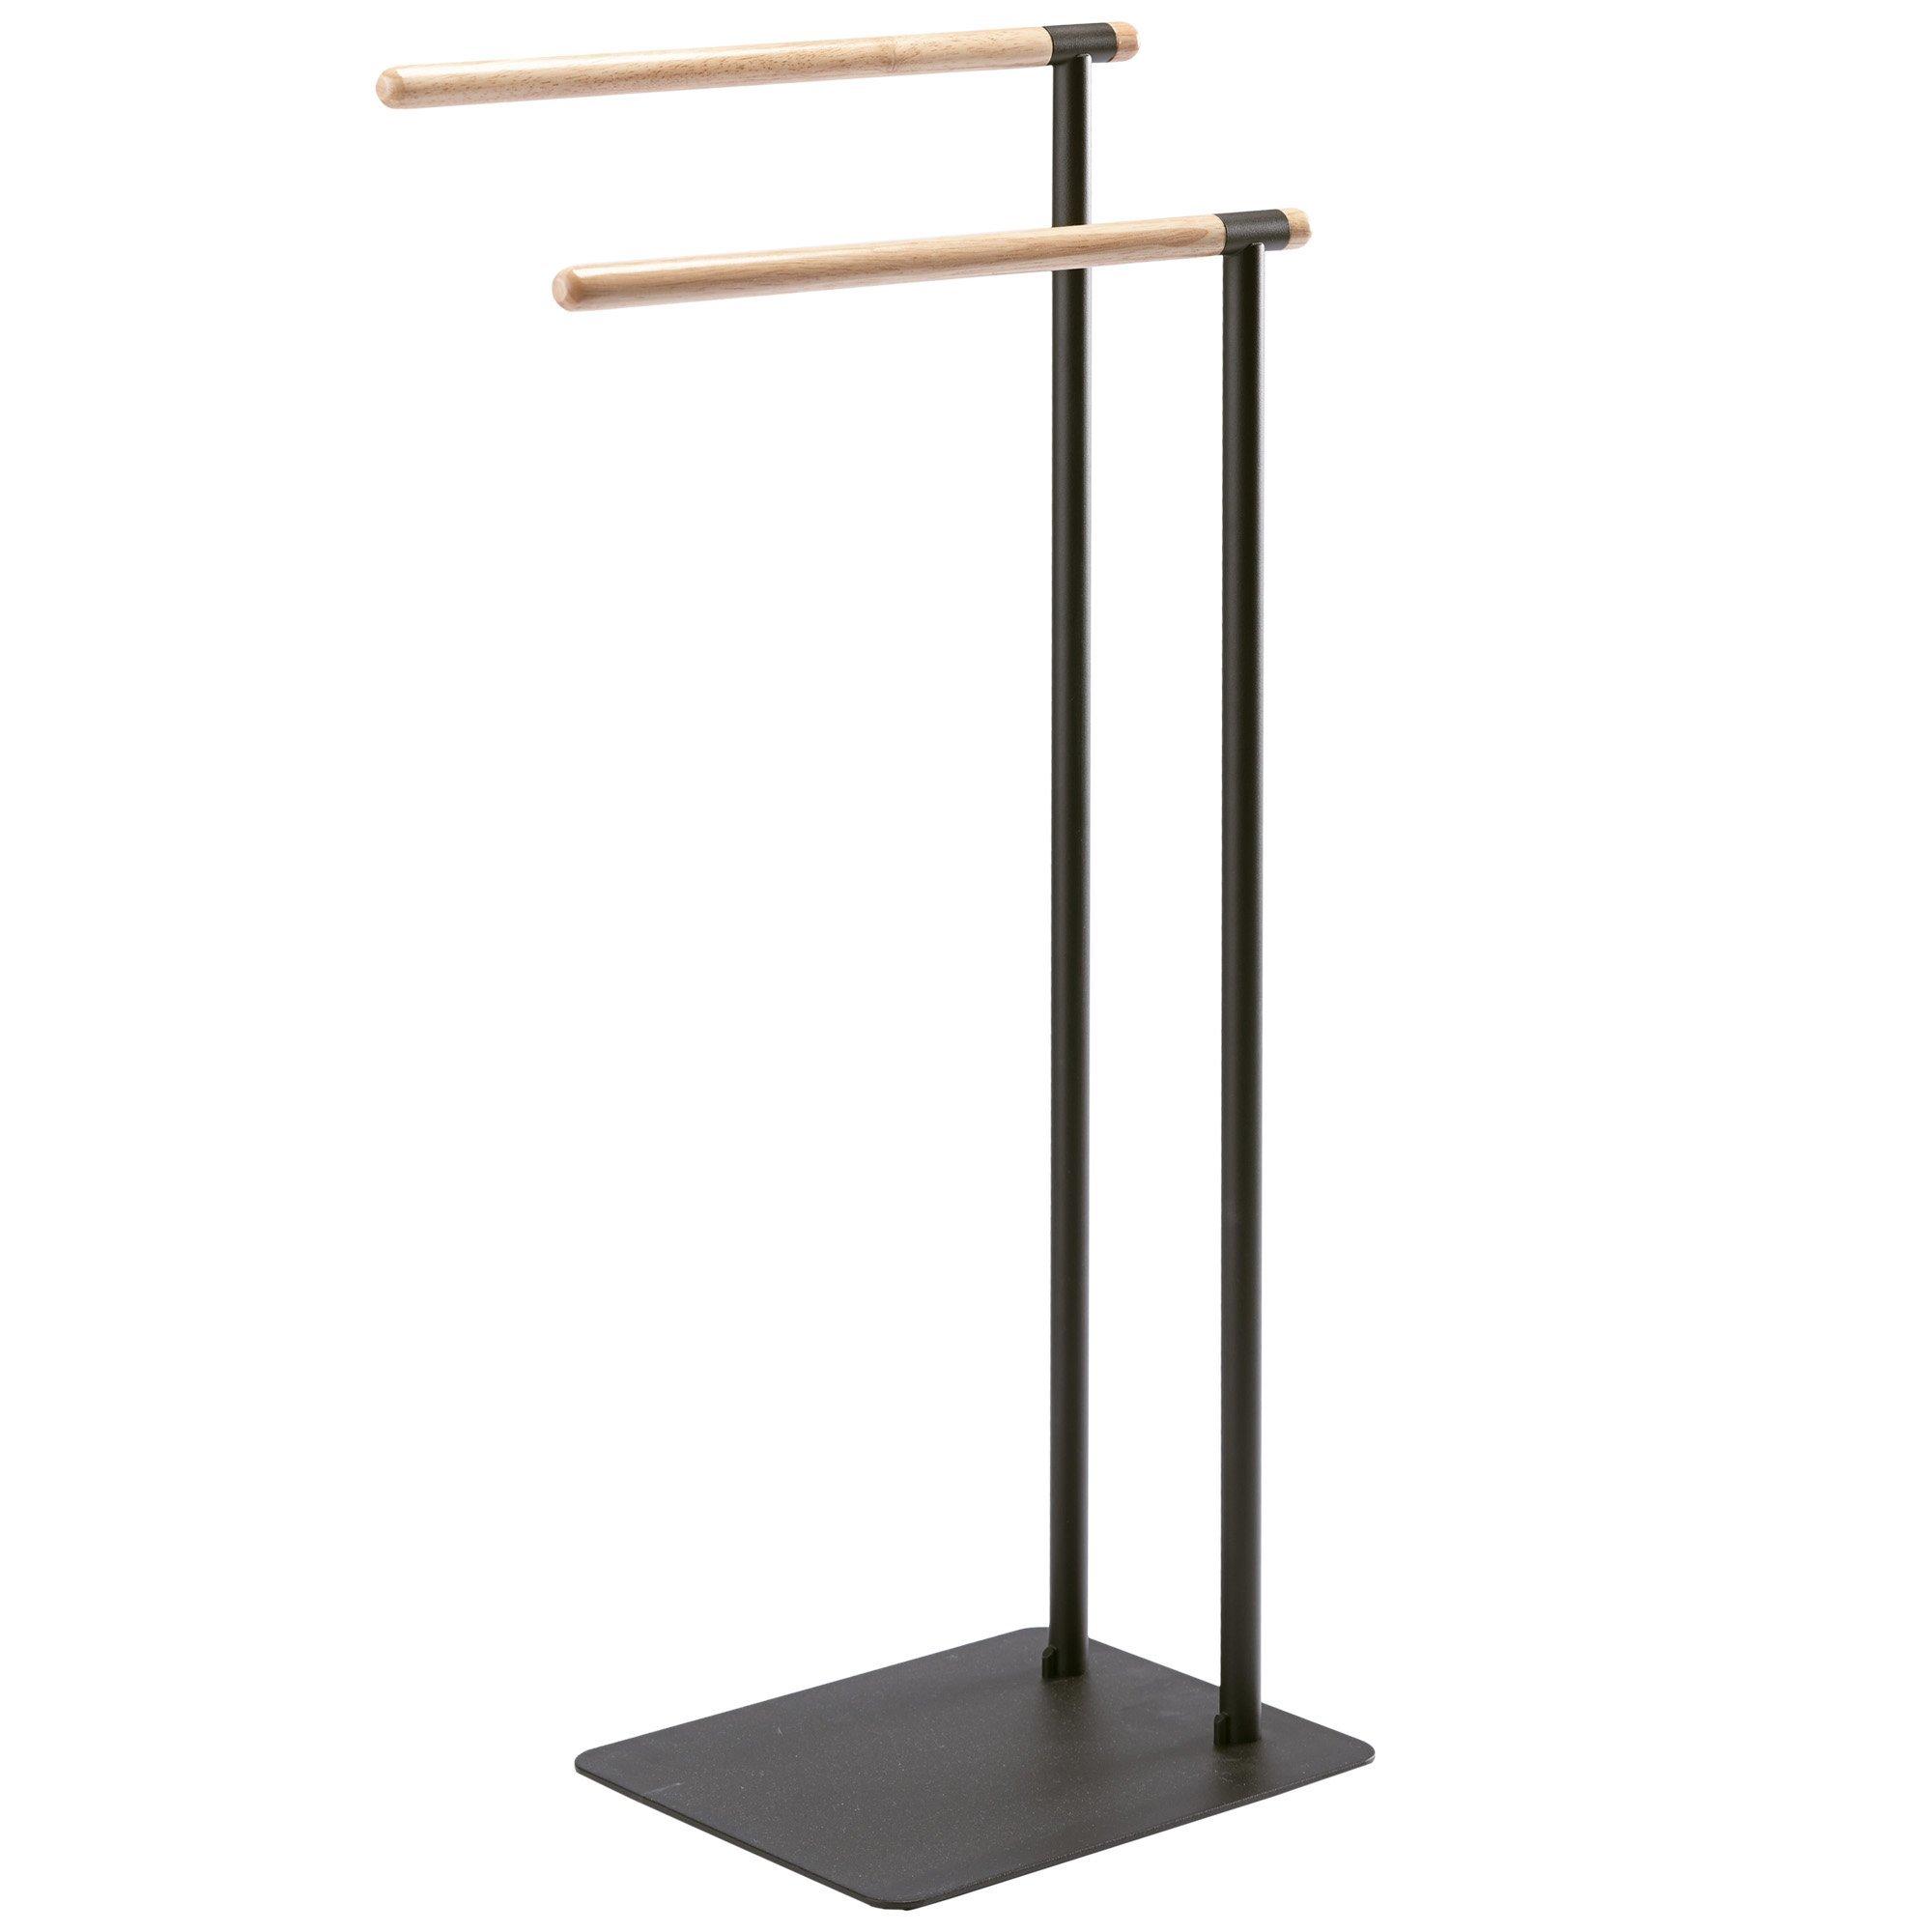 Nova Bath Collection Oscar Standing Double Towel Rack for Bathroom Spa Towel Hanger, Wood Rails (Black)